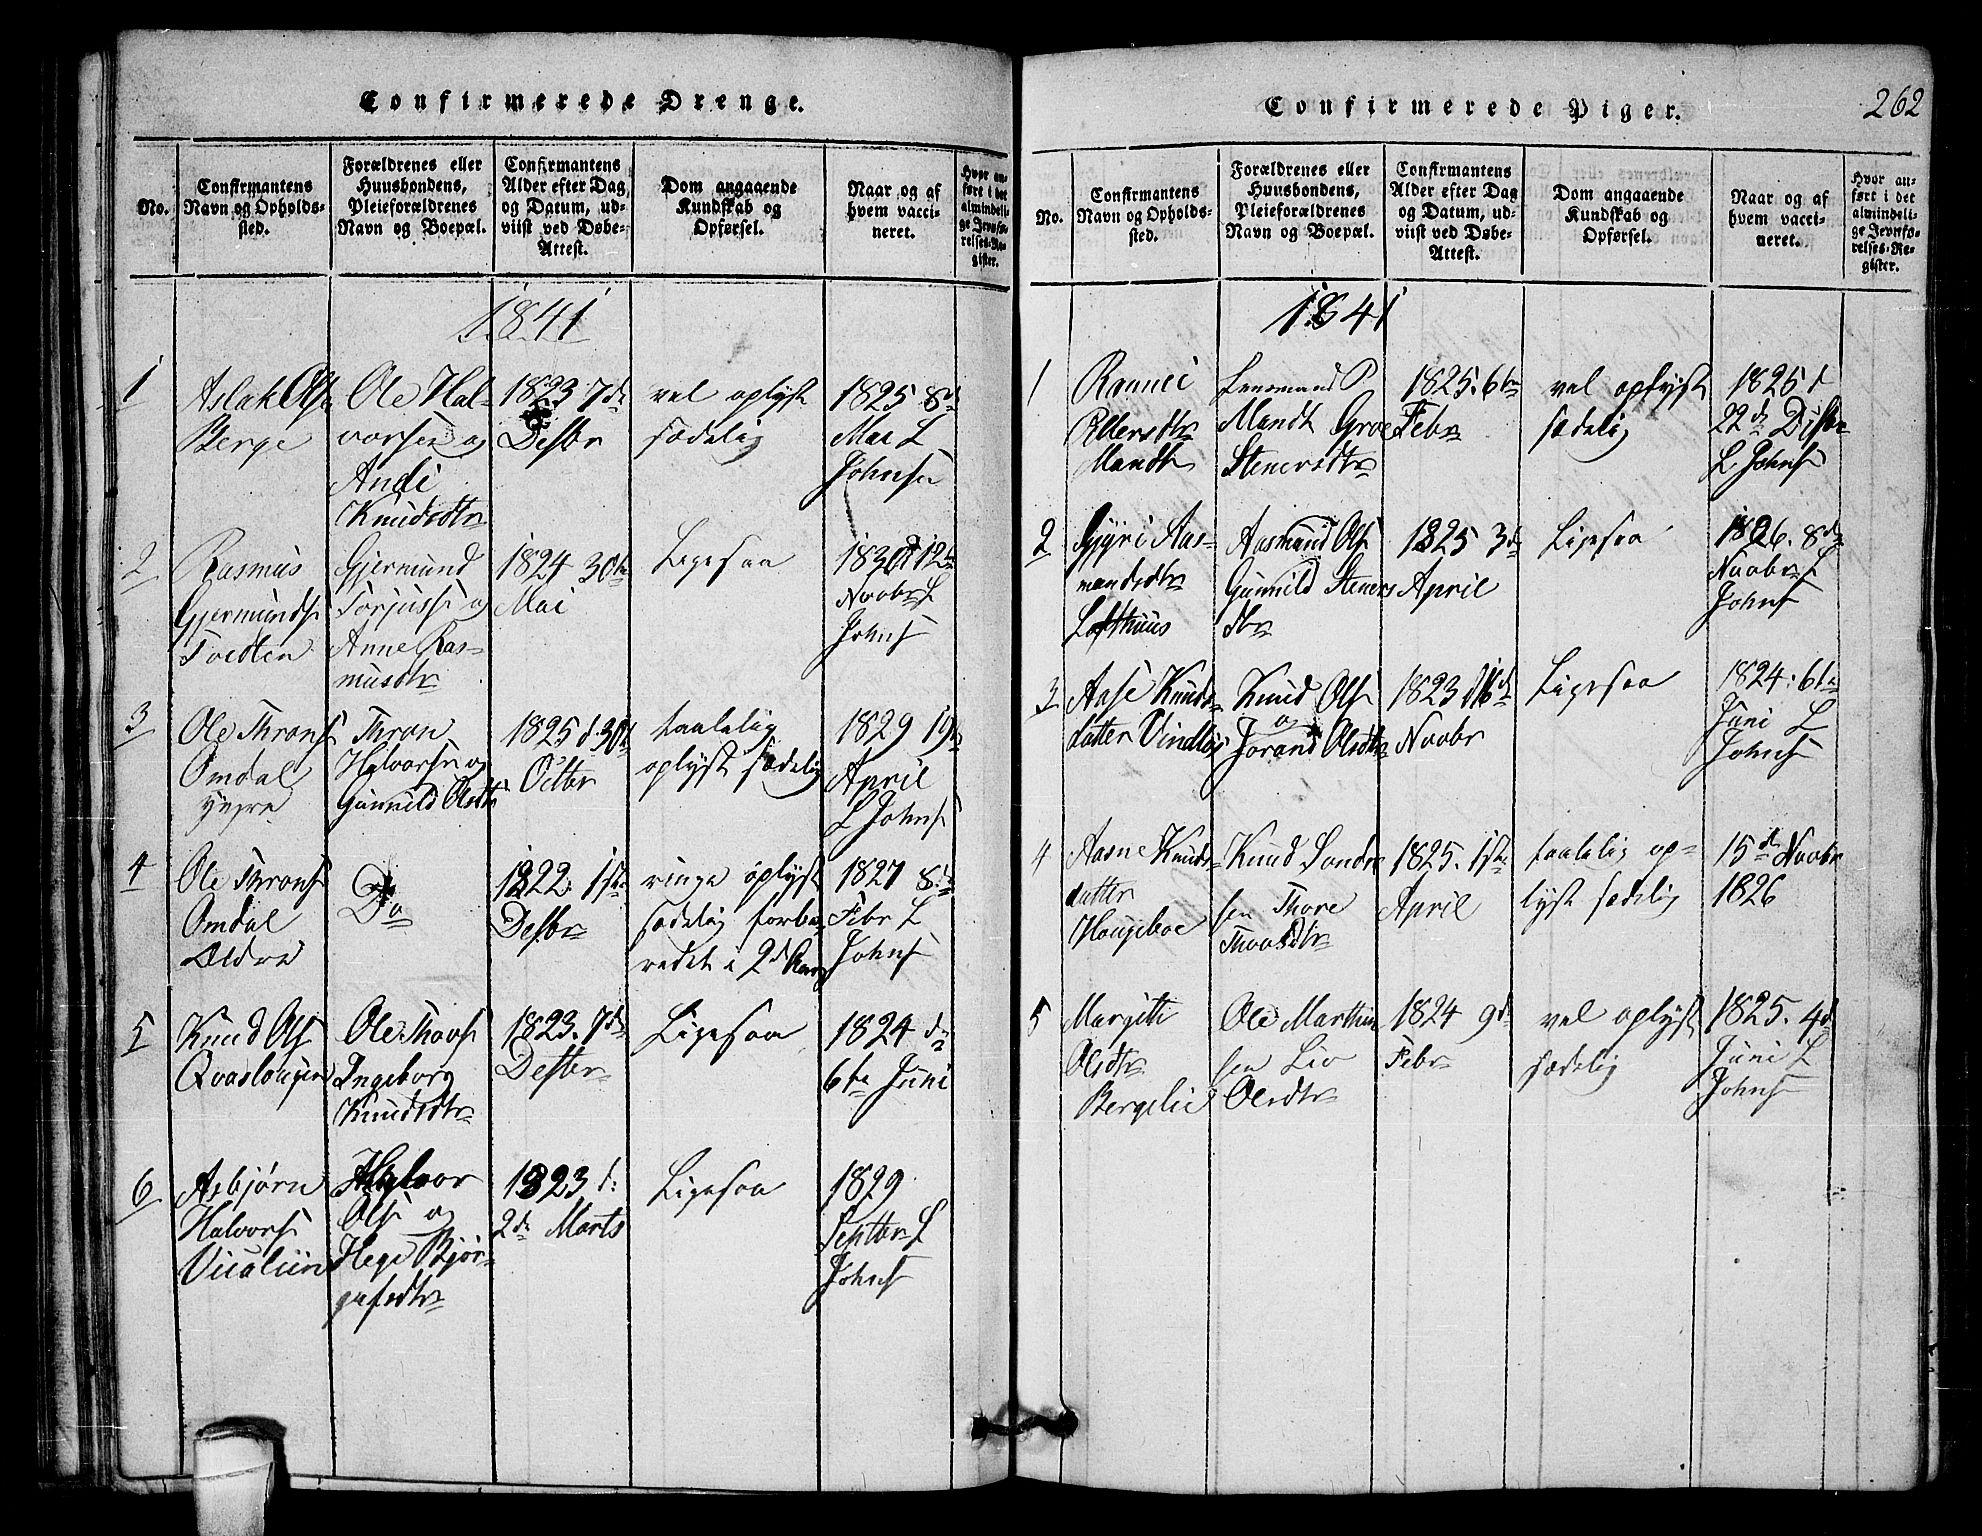 SAKO, Lårdal kirkebøker, G/Gb/L0001: Klokkerbok nr. II 1, 1815-1865, s. 262